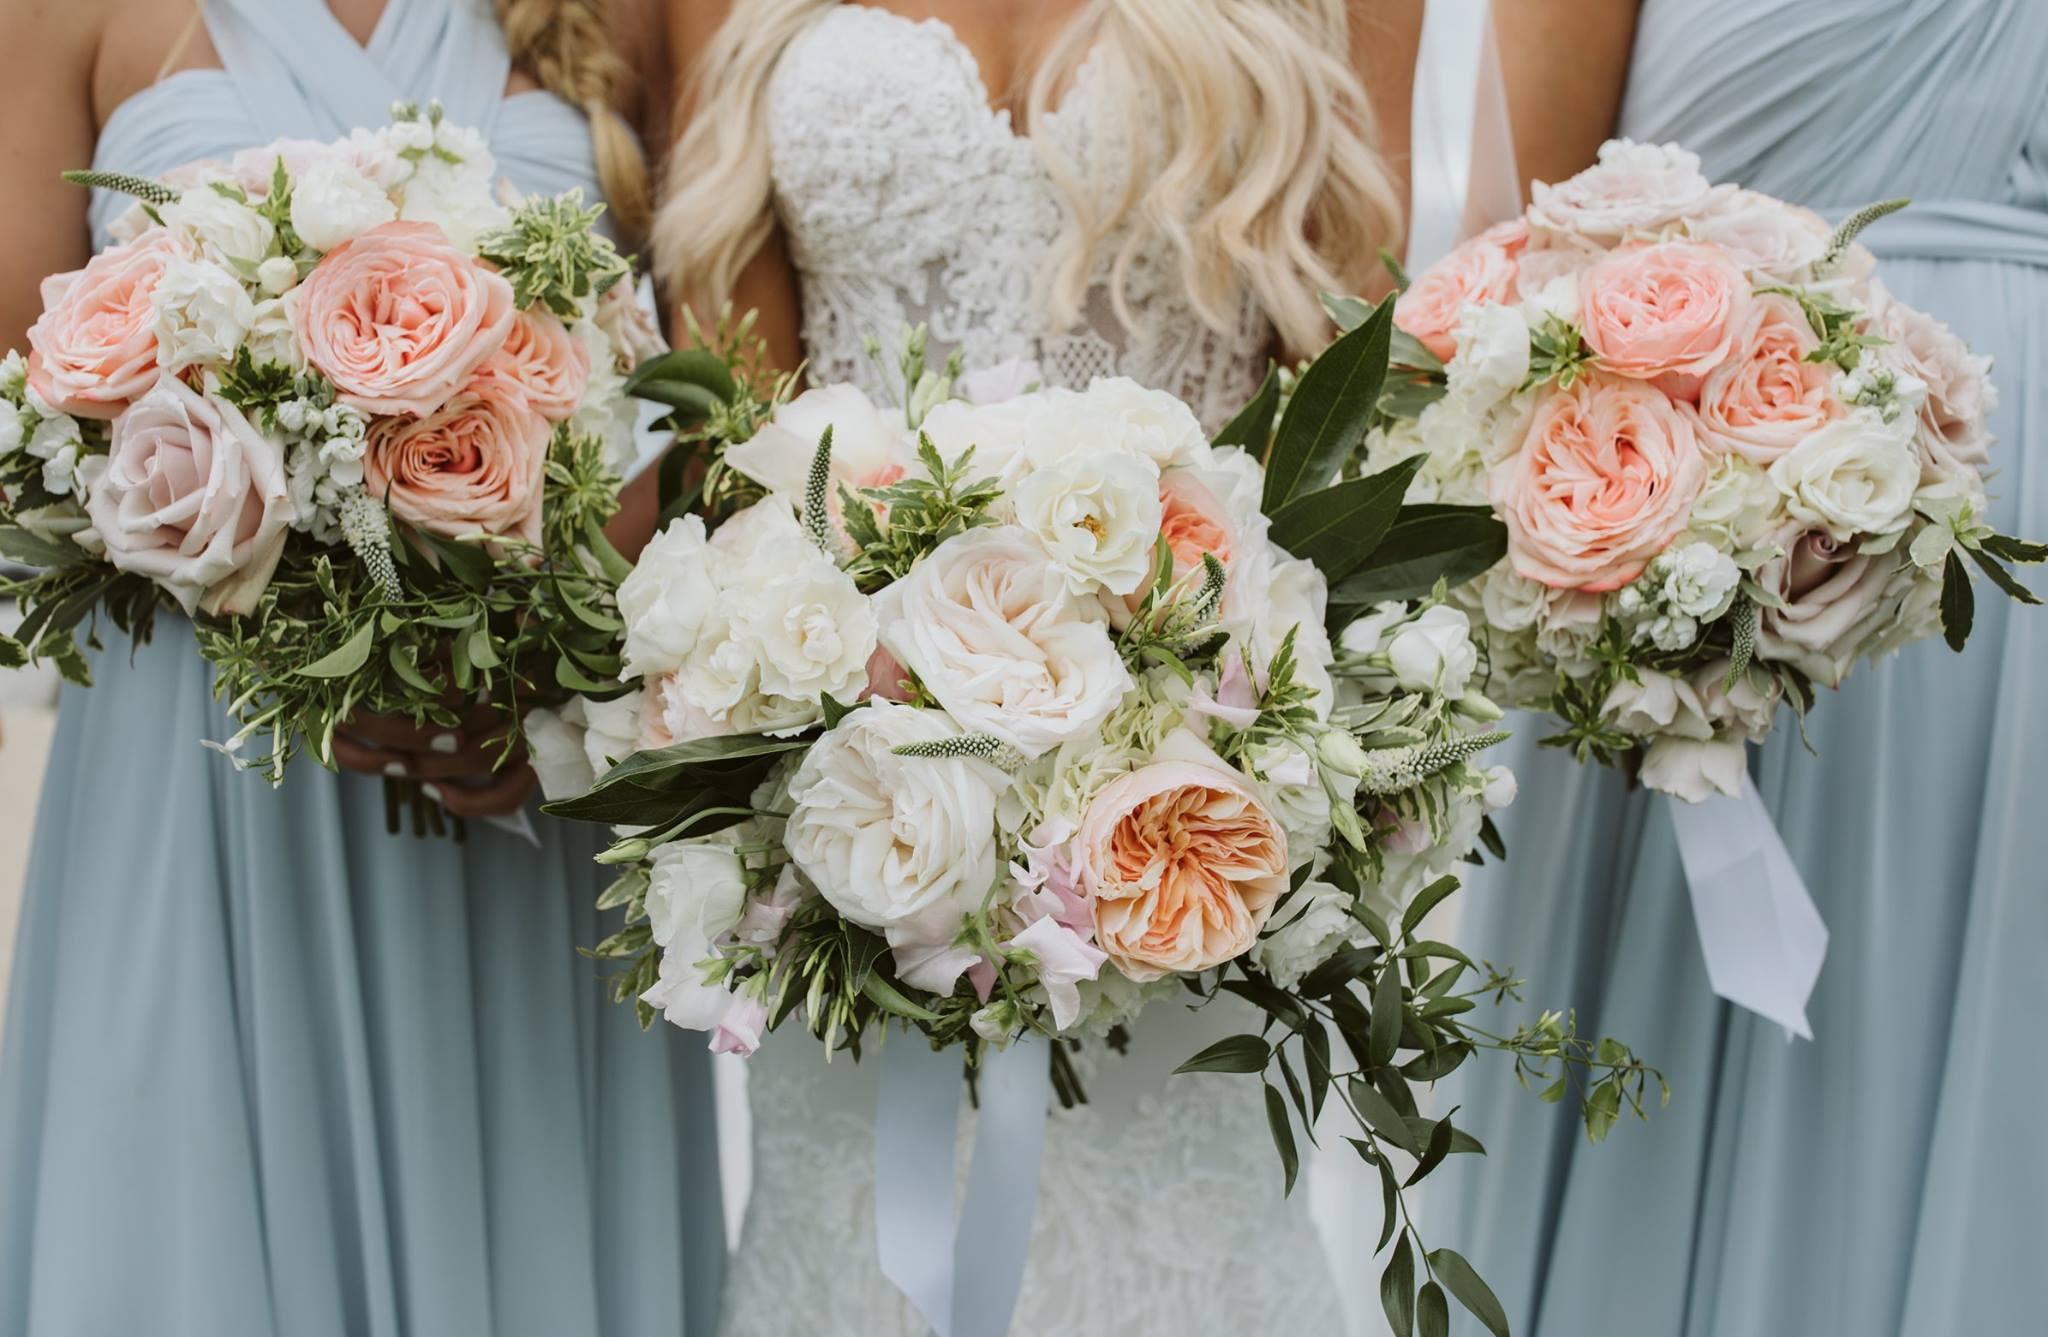 2018 Kayla & Brian - Azalea Events bouquet details.jpg